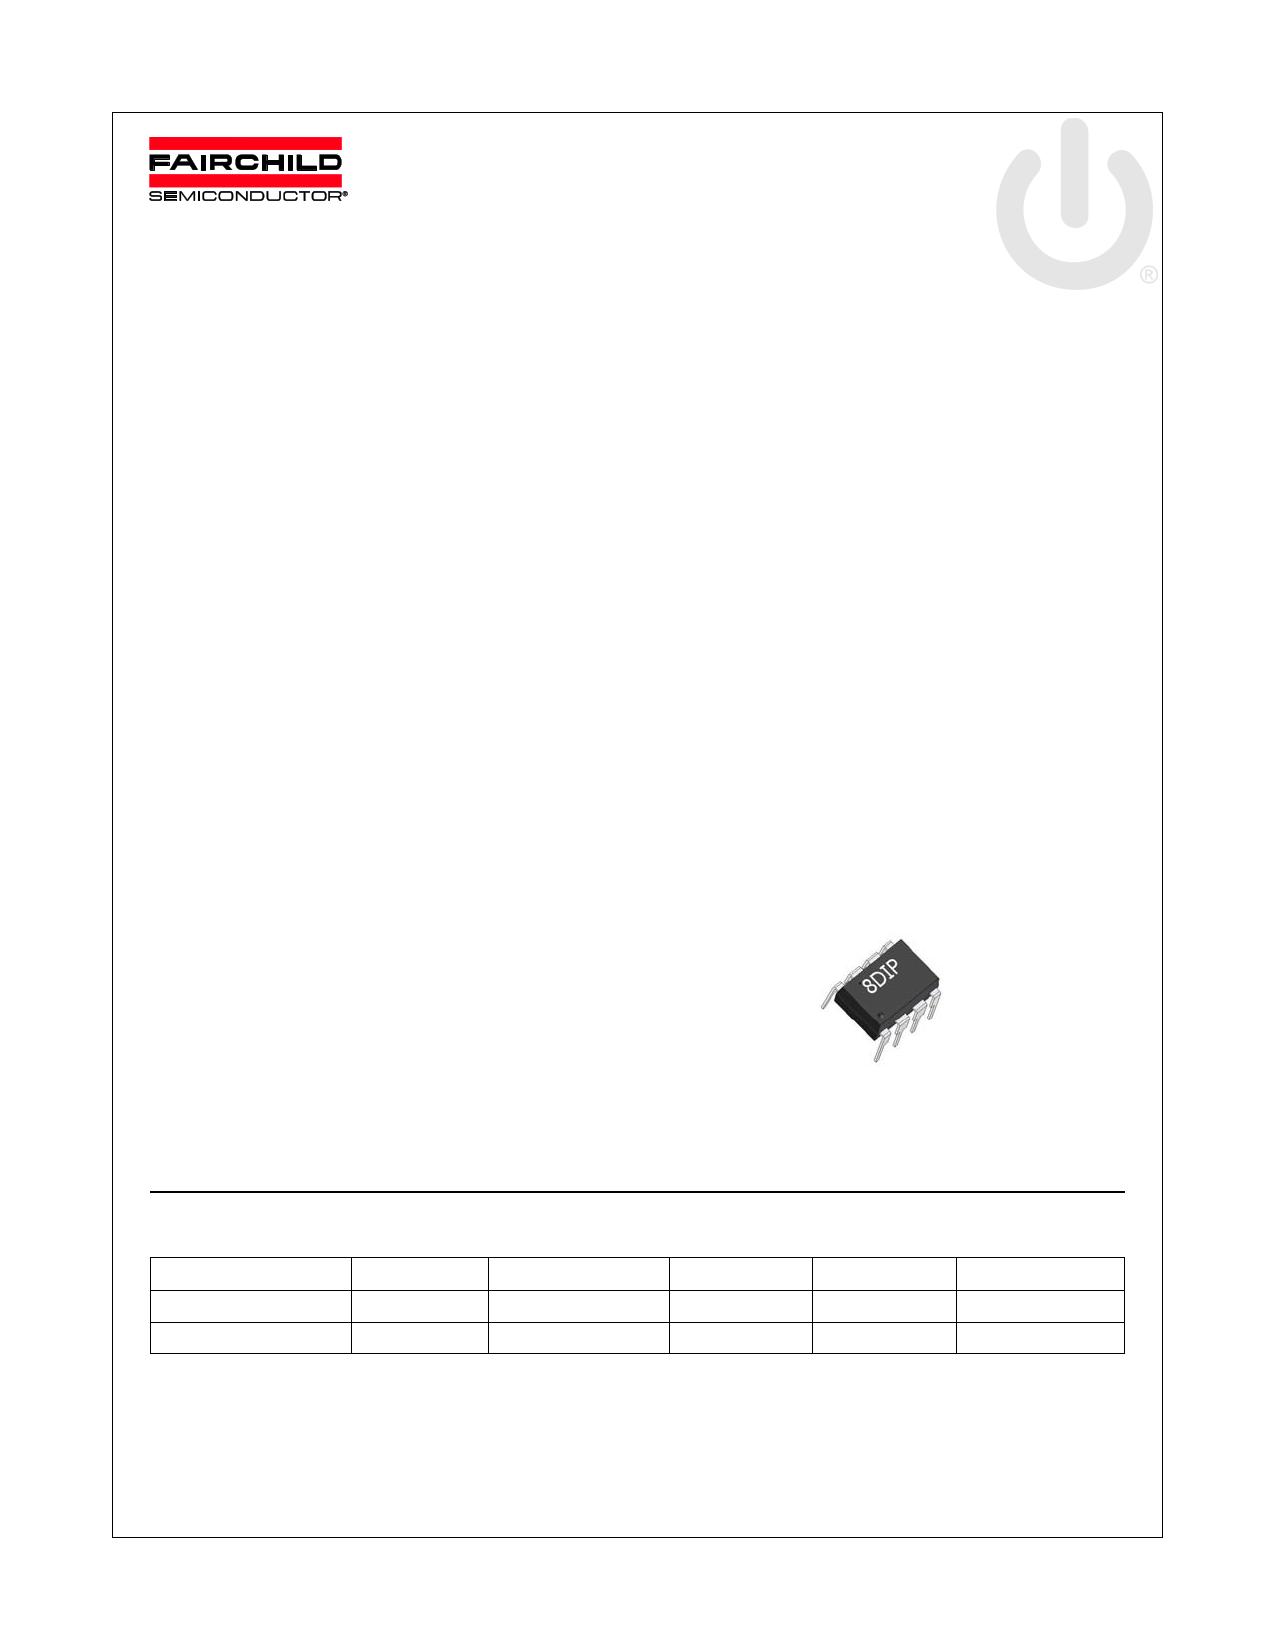 Q0270RA datasheet